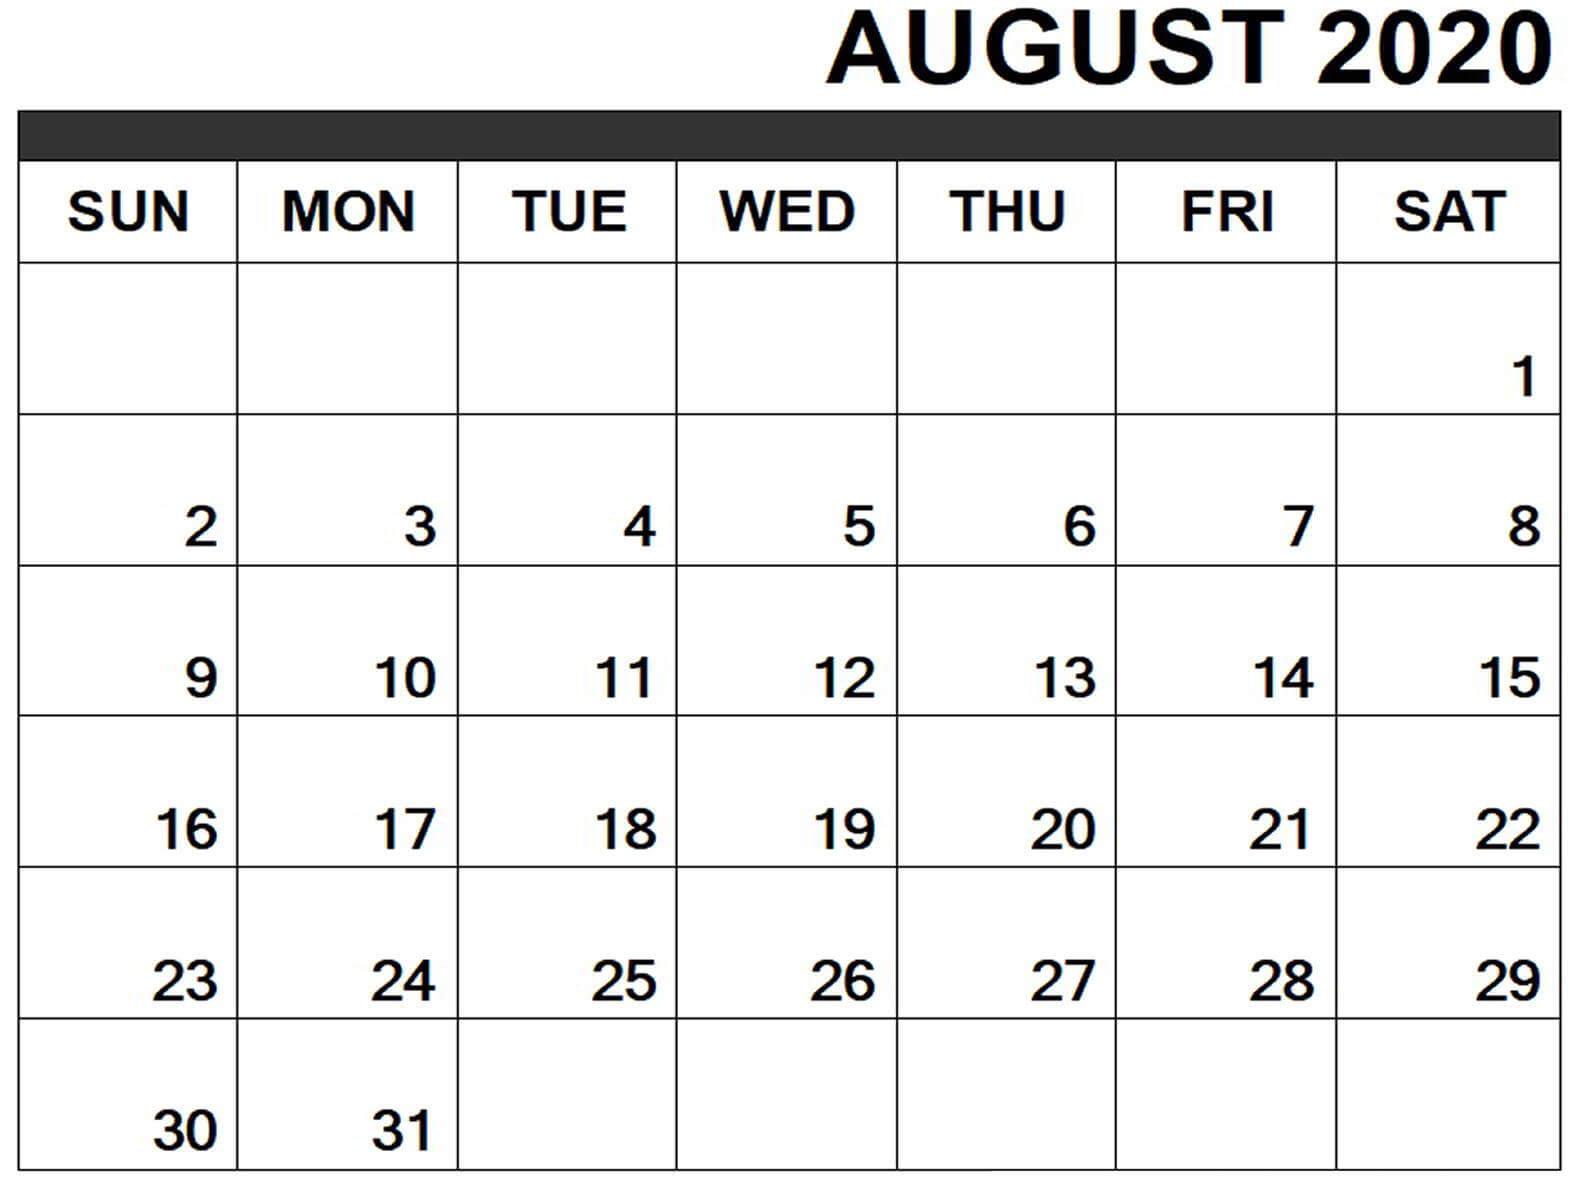 August 2020 Excel Calendar